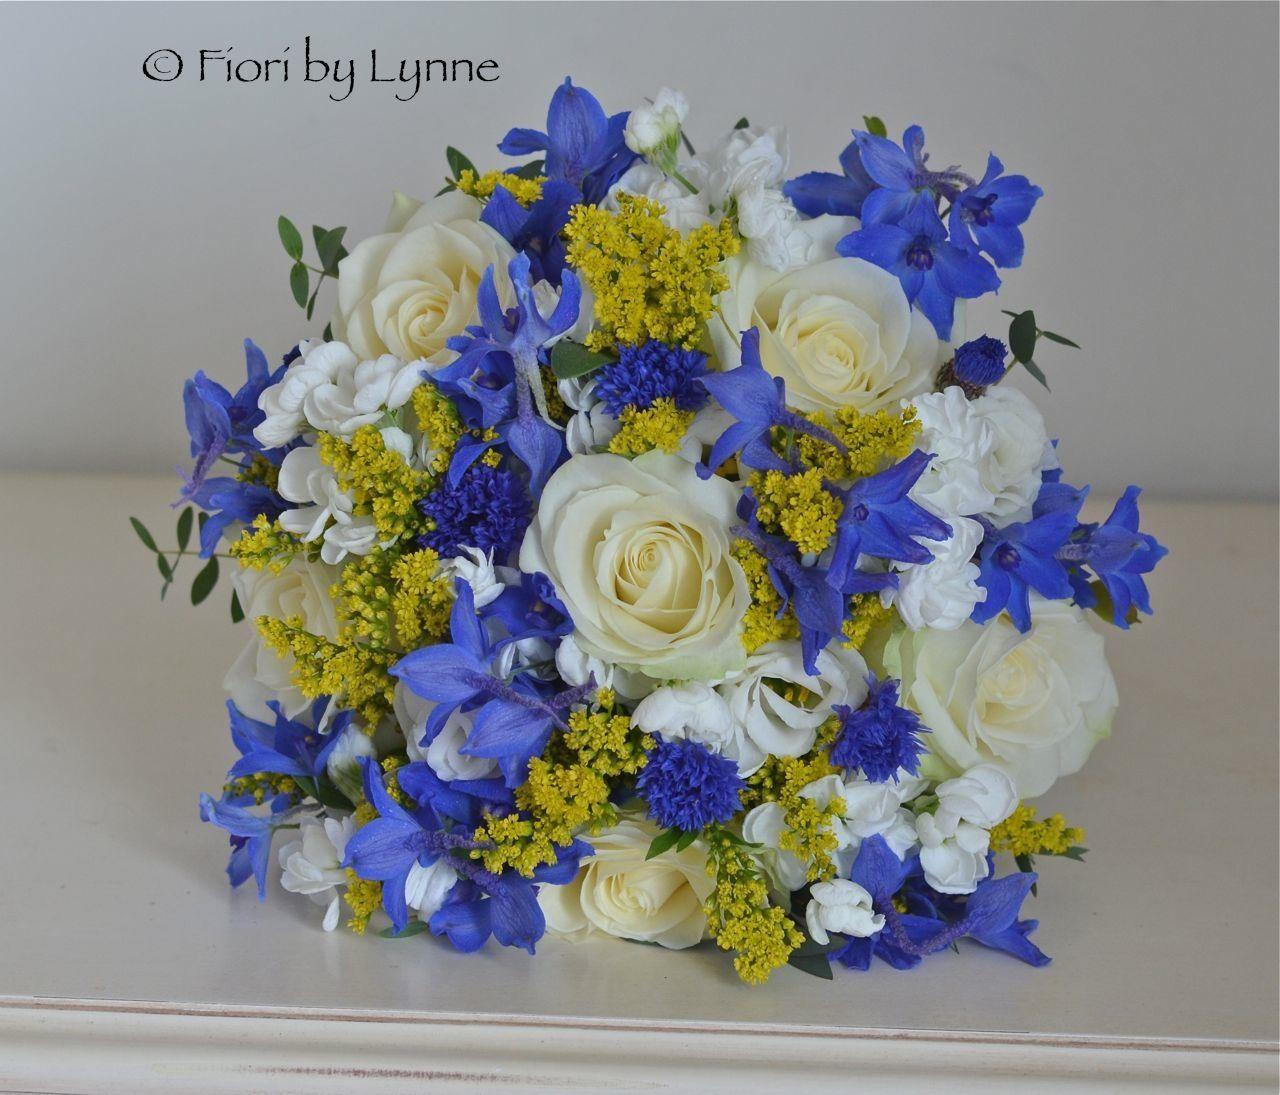 Wedding Flowers In May: Wedding Flowers Blog: May 2013